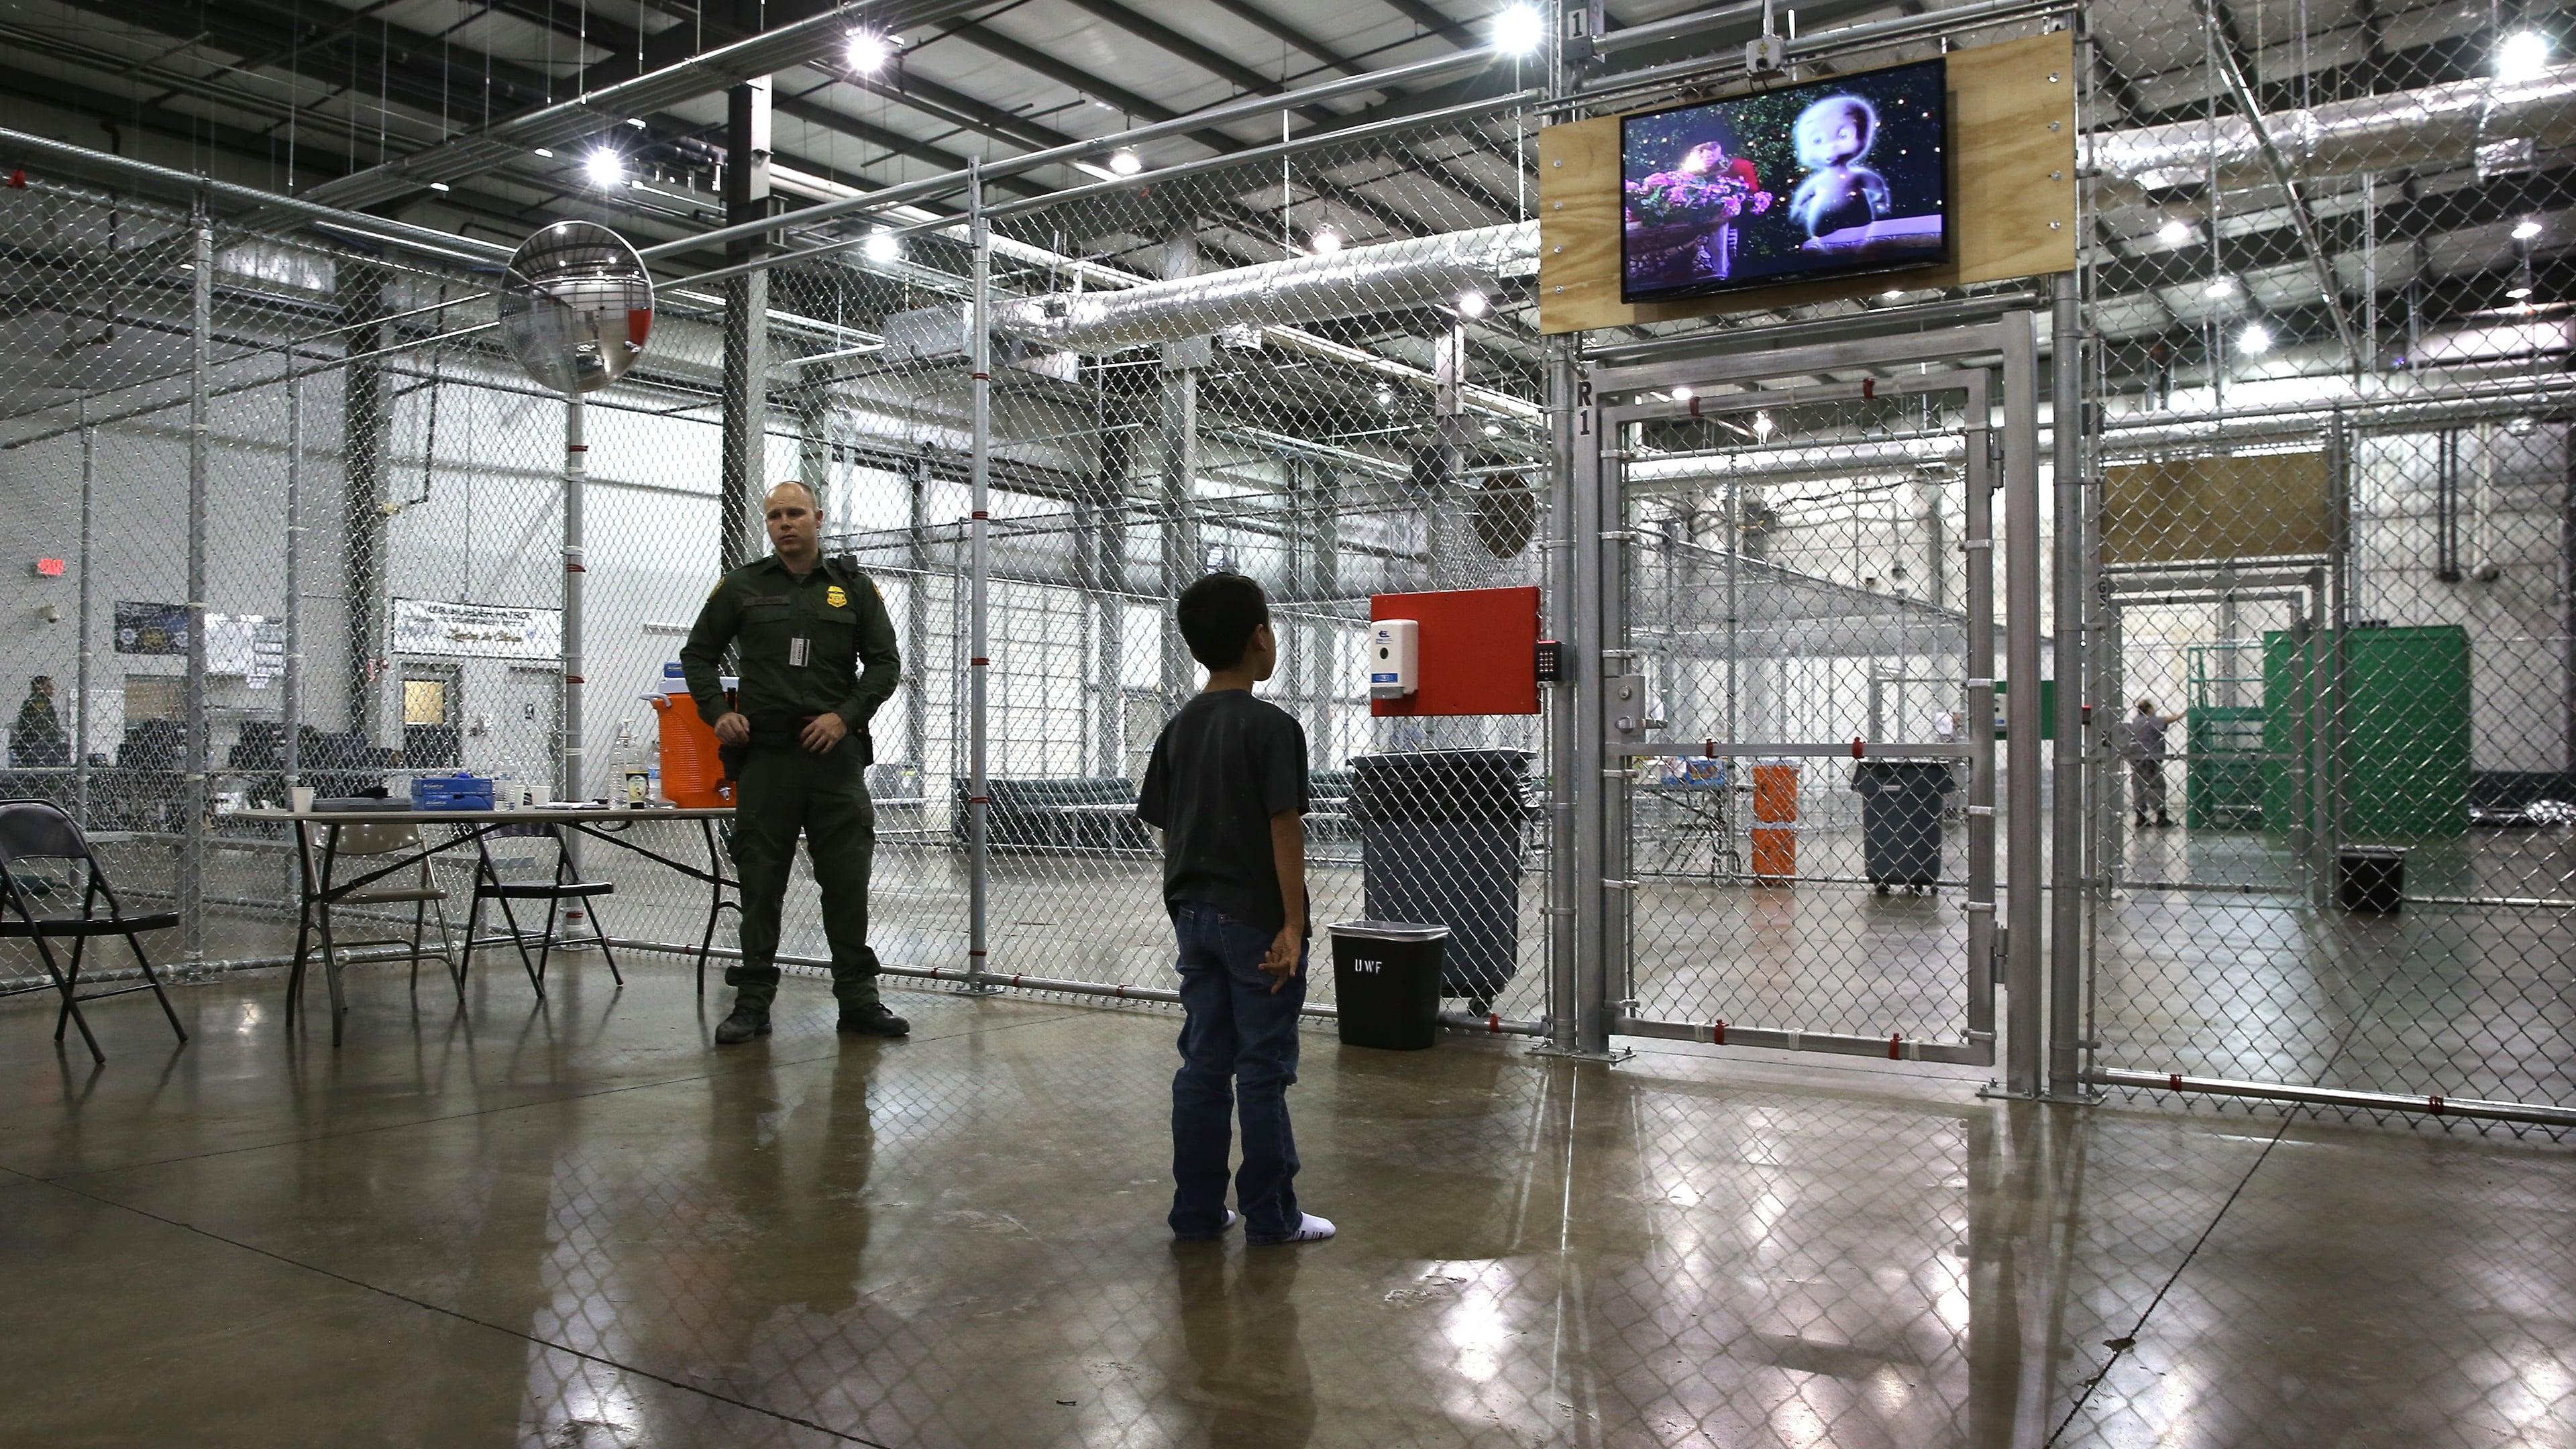 PBS NewsHour Season 43 :Episode 124  June 21, 2018